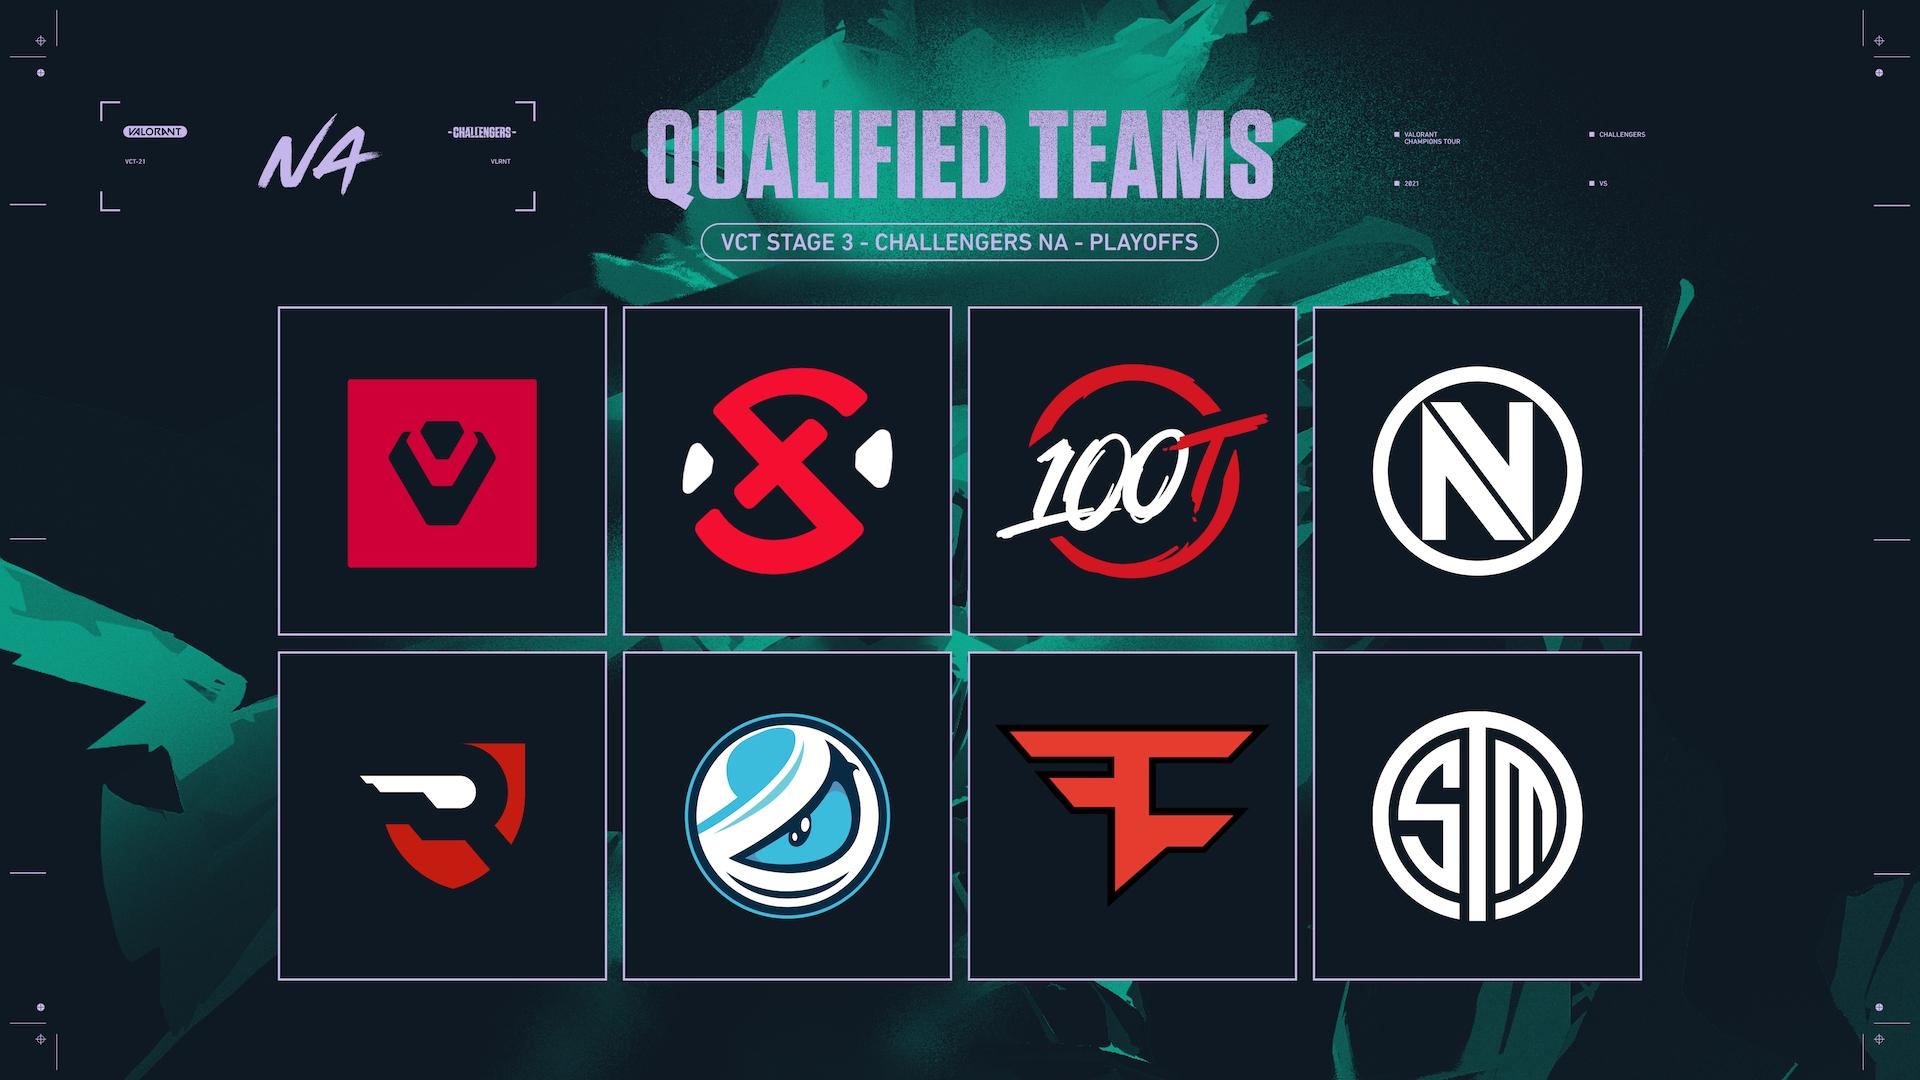 Qualifying-Teams-Playoffs.jpg